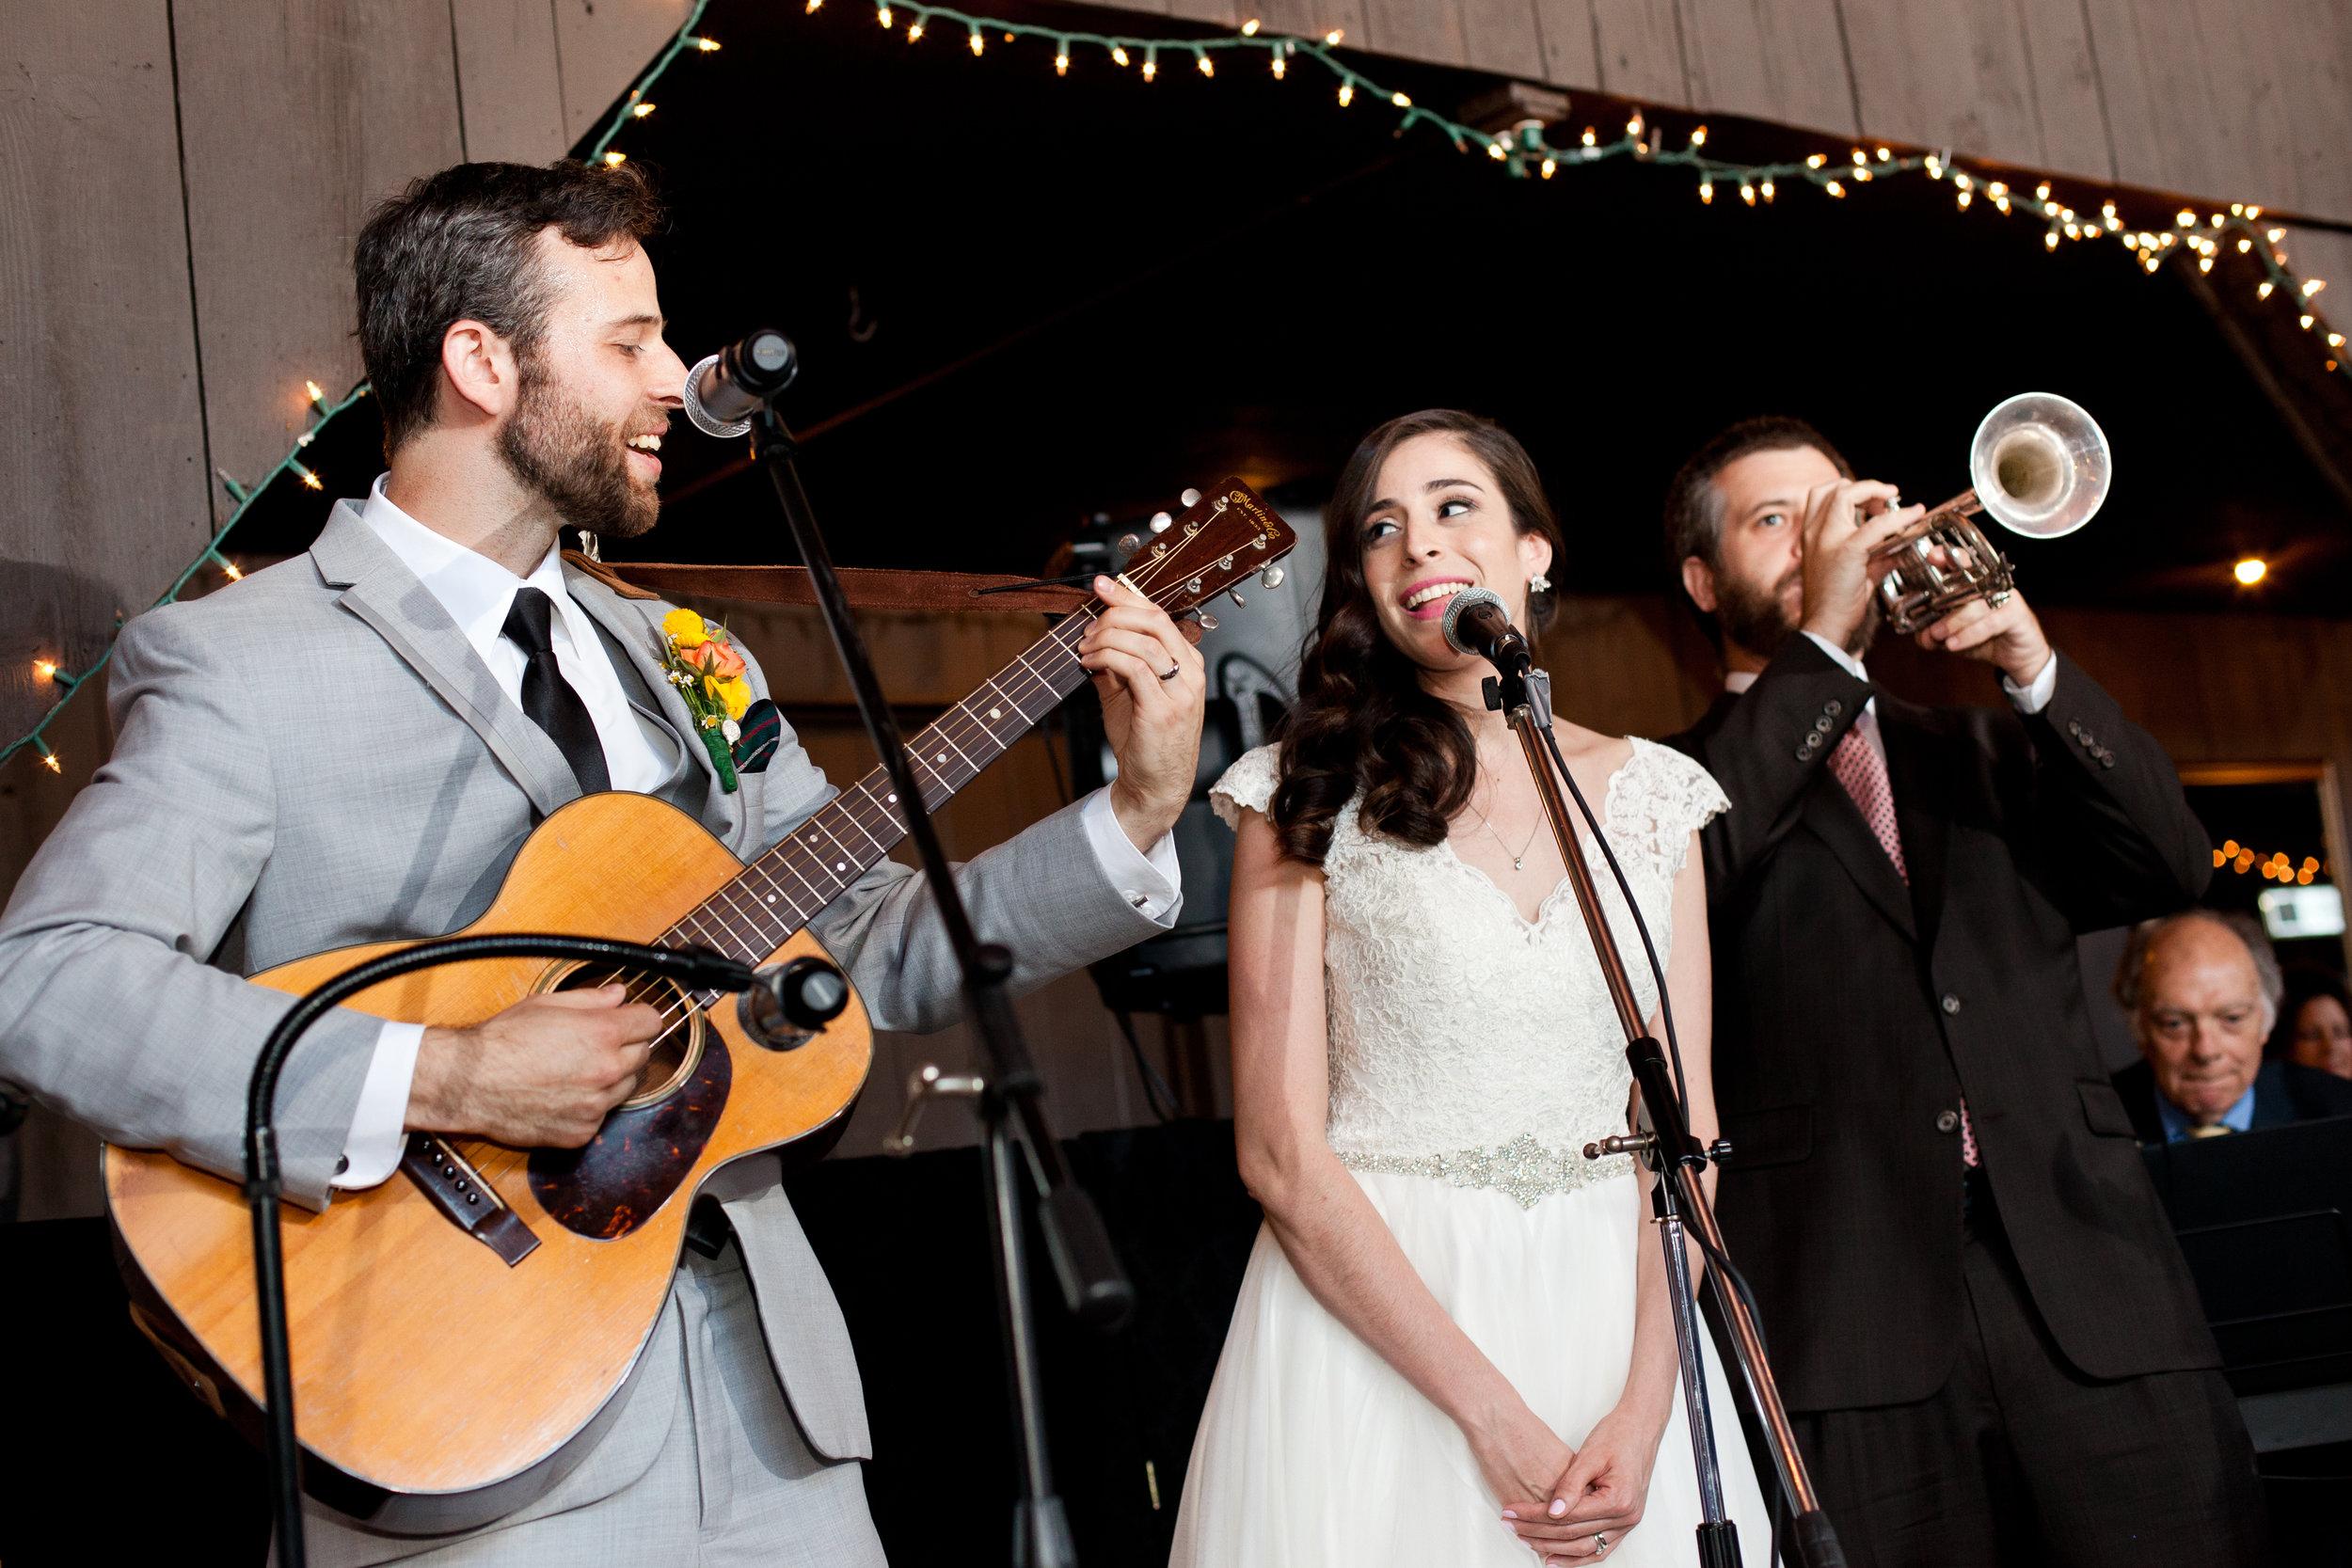 performing with david wedding 1.jpeg